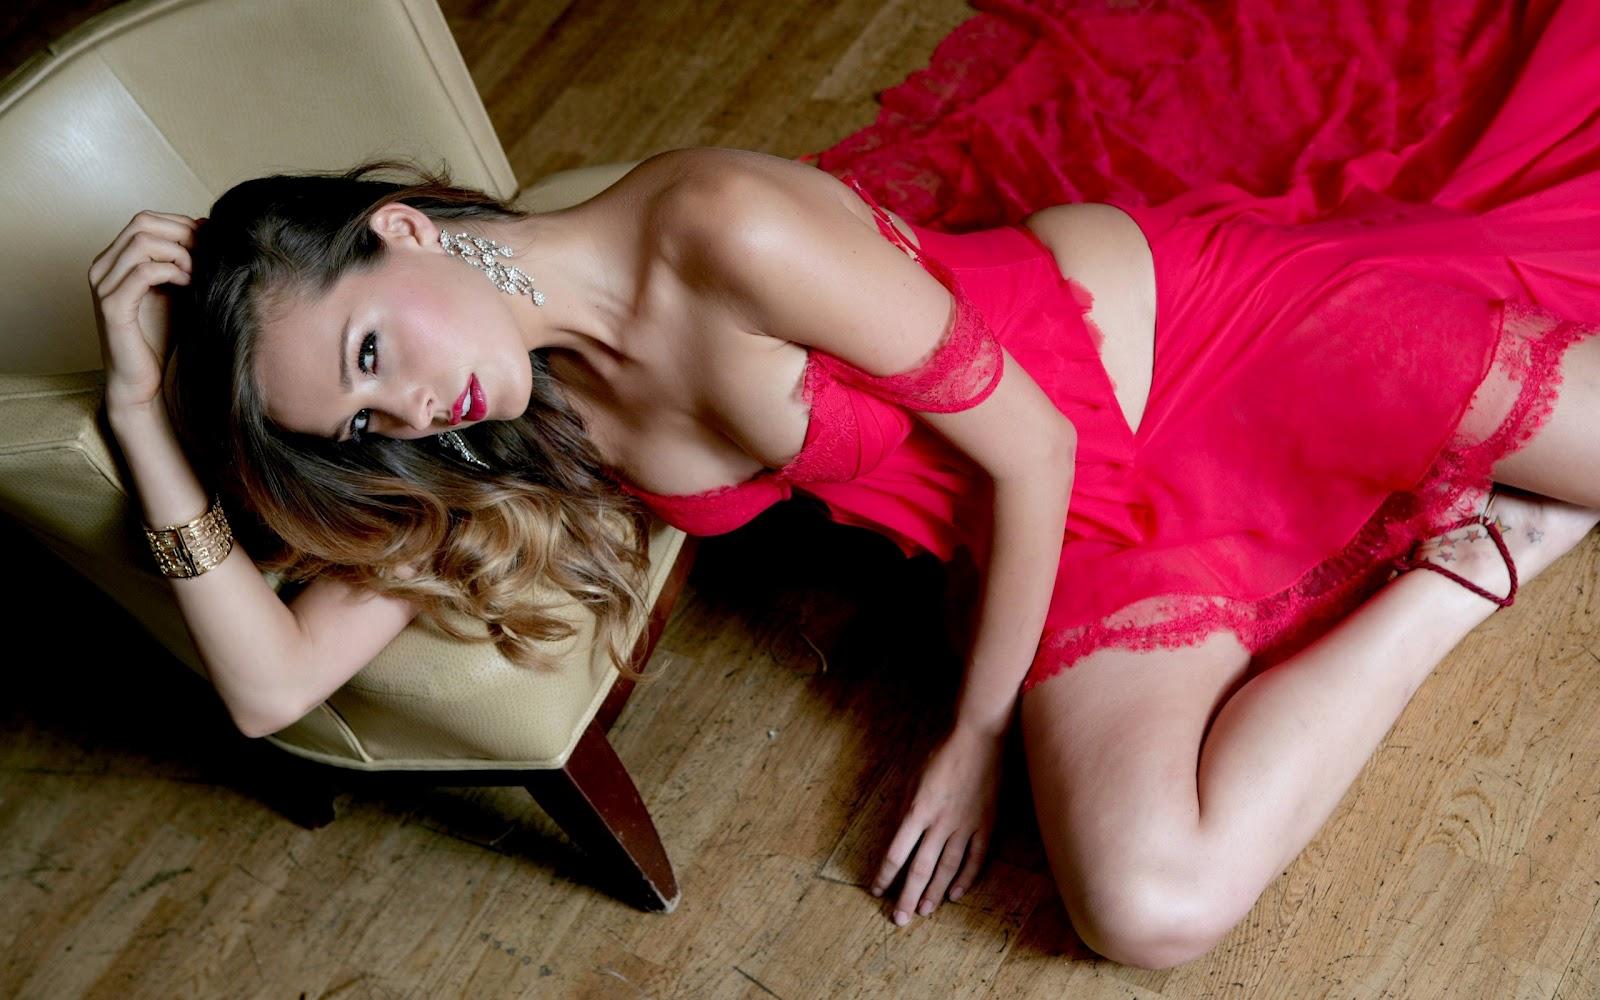 Beautiful Hot And Sexy Girls Hd Wallpaper  Etc Hot Photos-6045